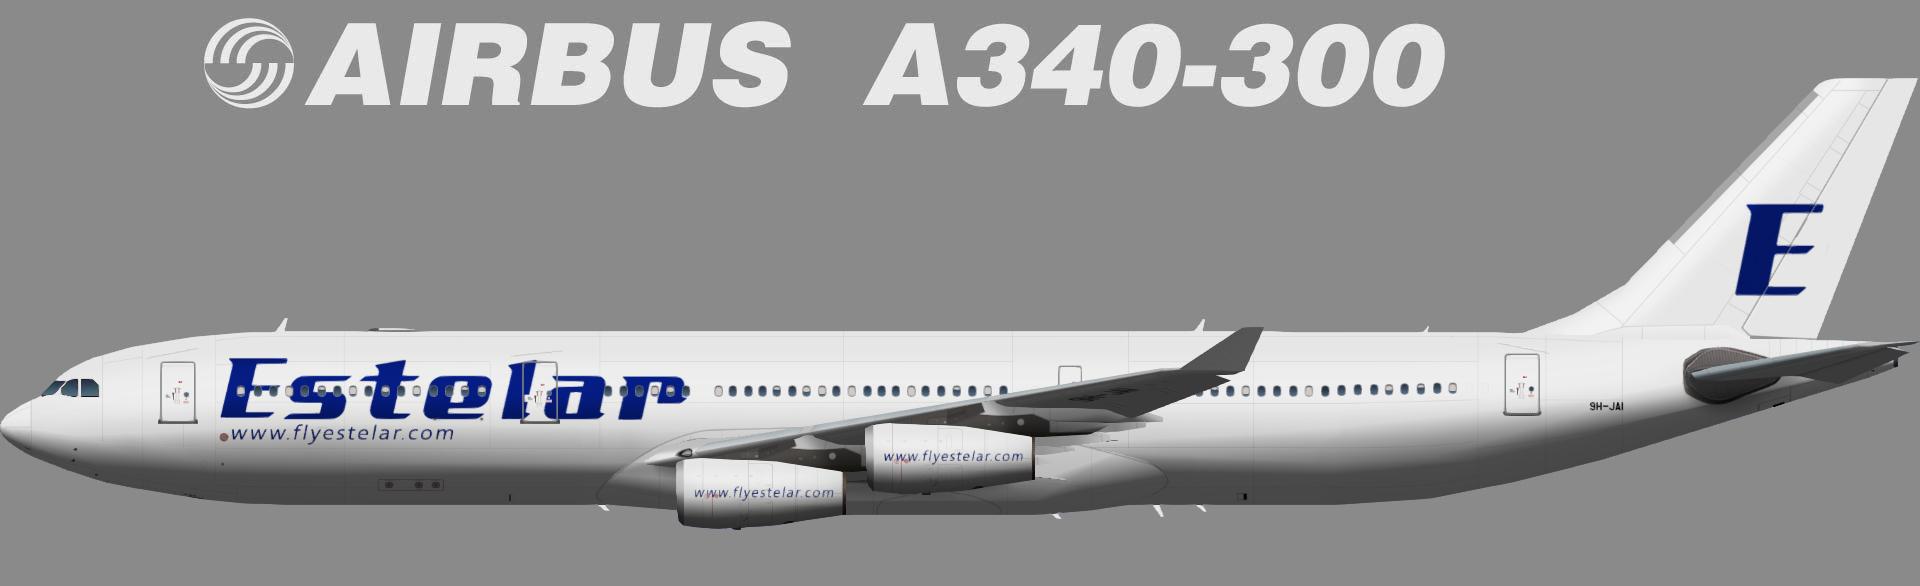 TFS HiFly Malta (opf Aerolineas Estelar Latinoamerica) Airbus A340-300